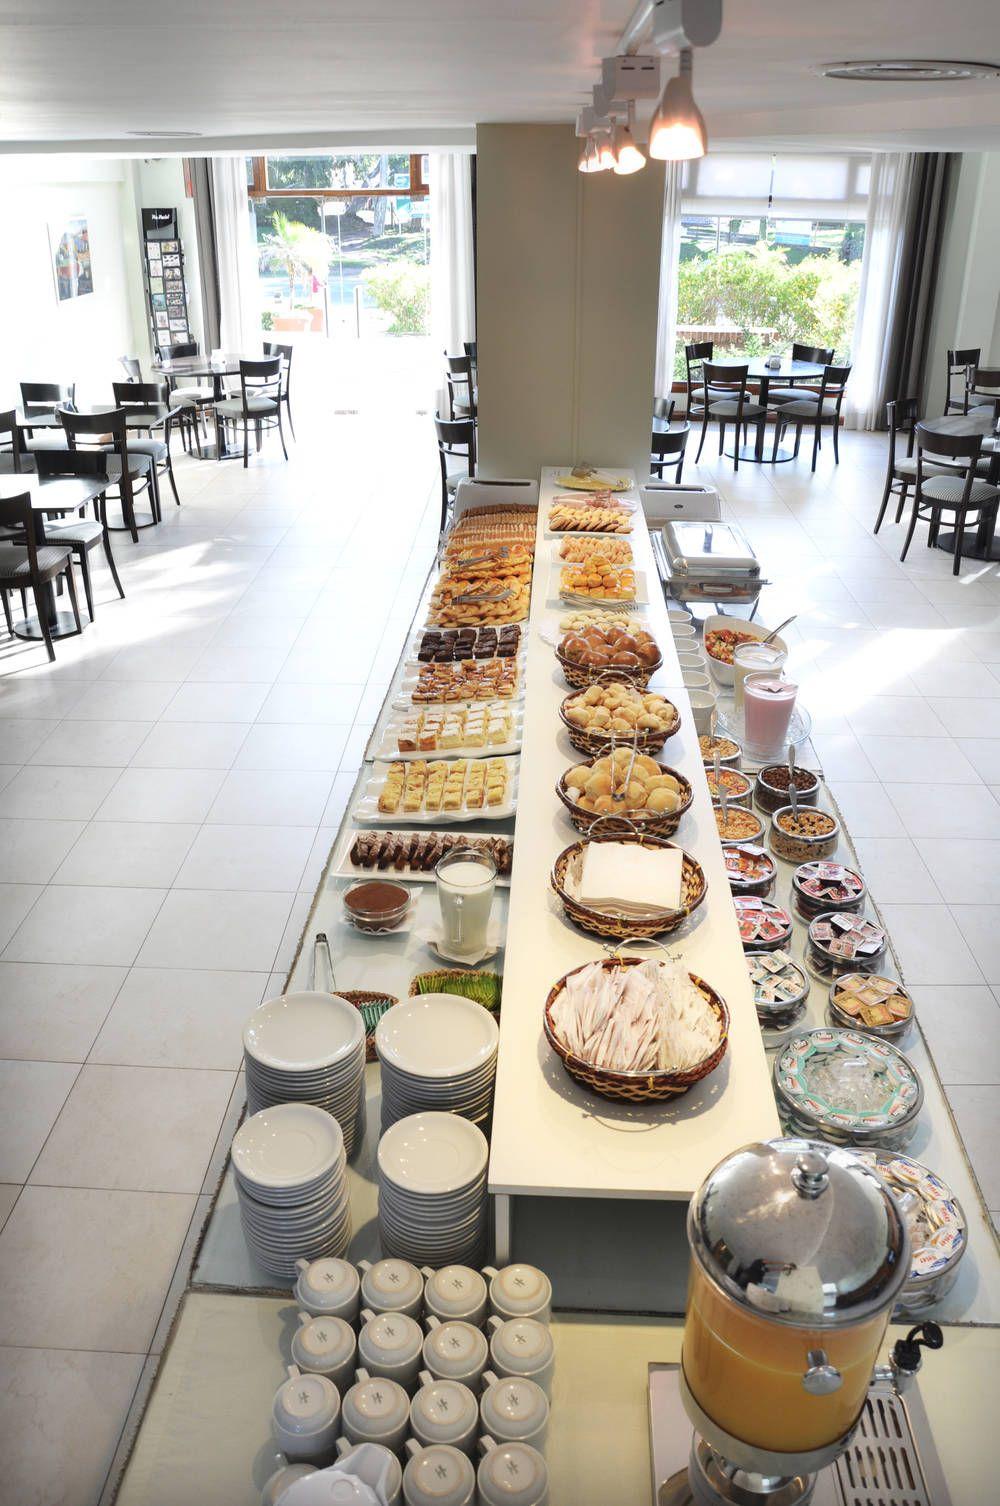 Desayuno Buffet Cafe Da Manha De Hotel Buffet Cafe Da Manha